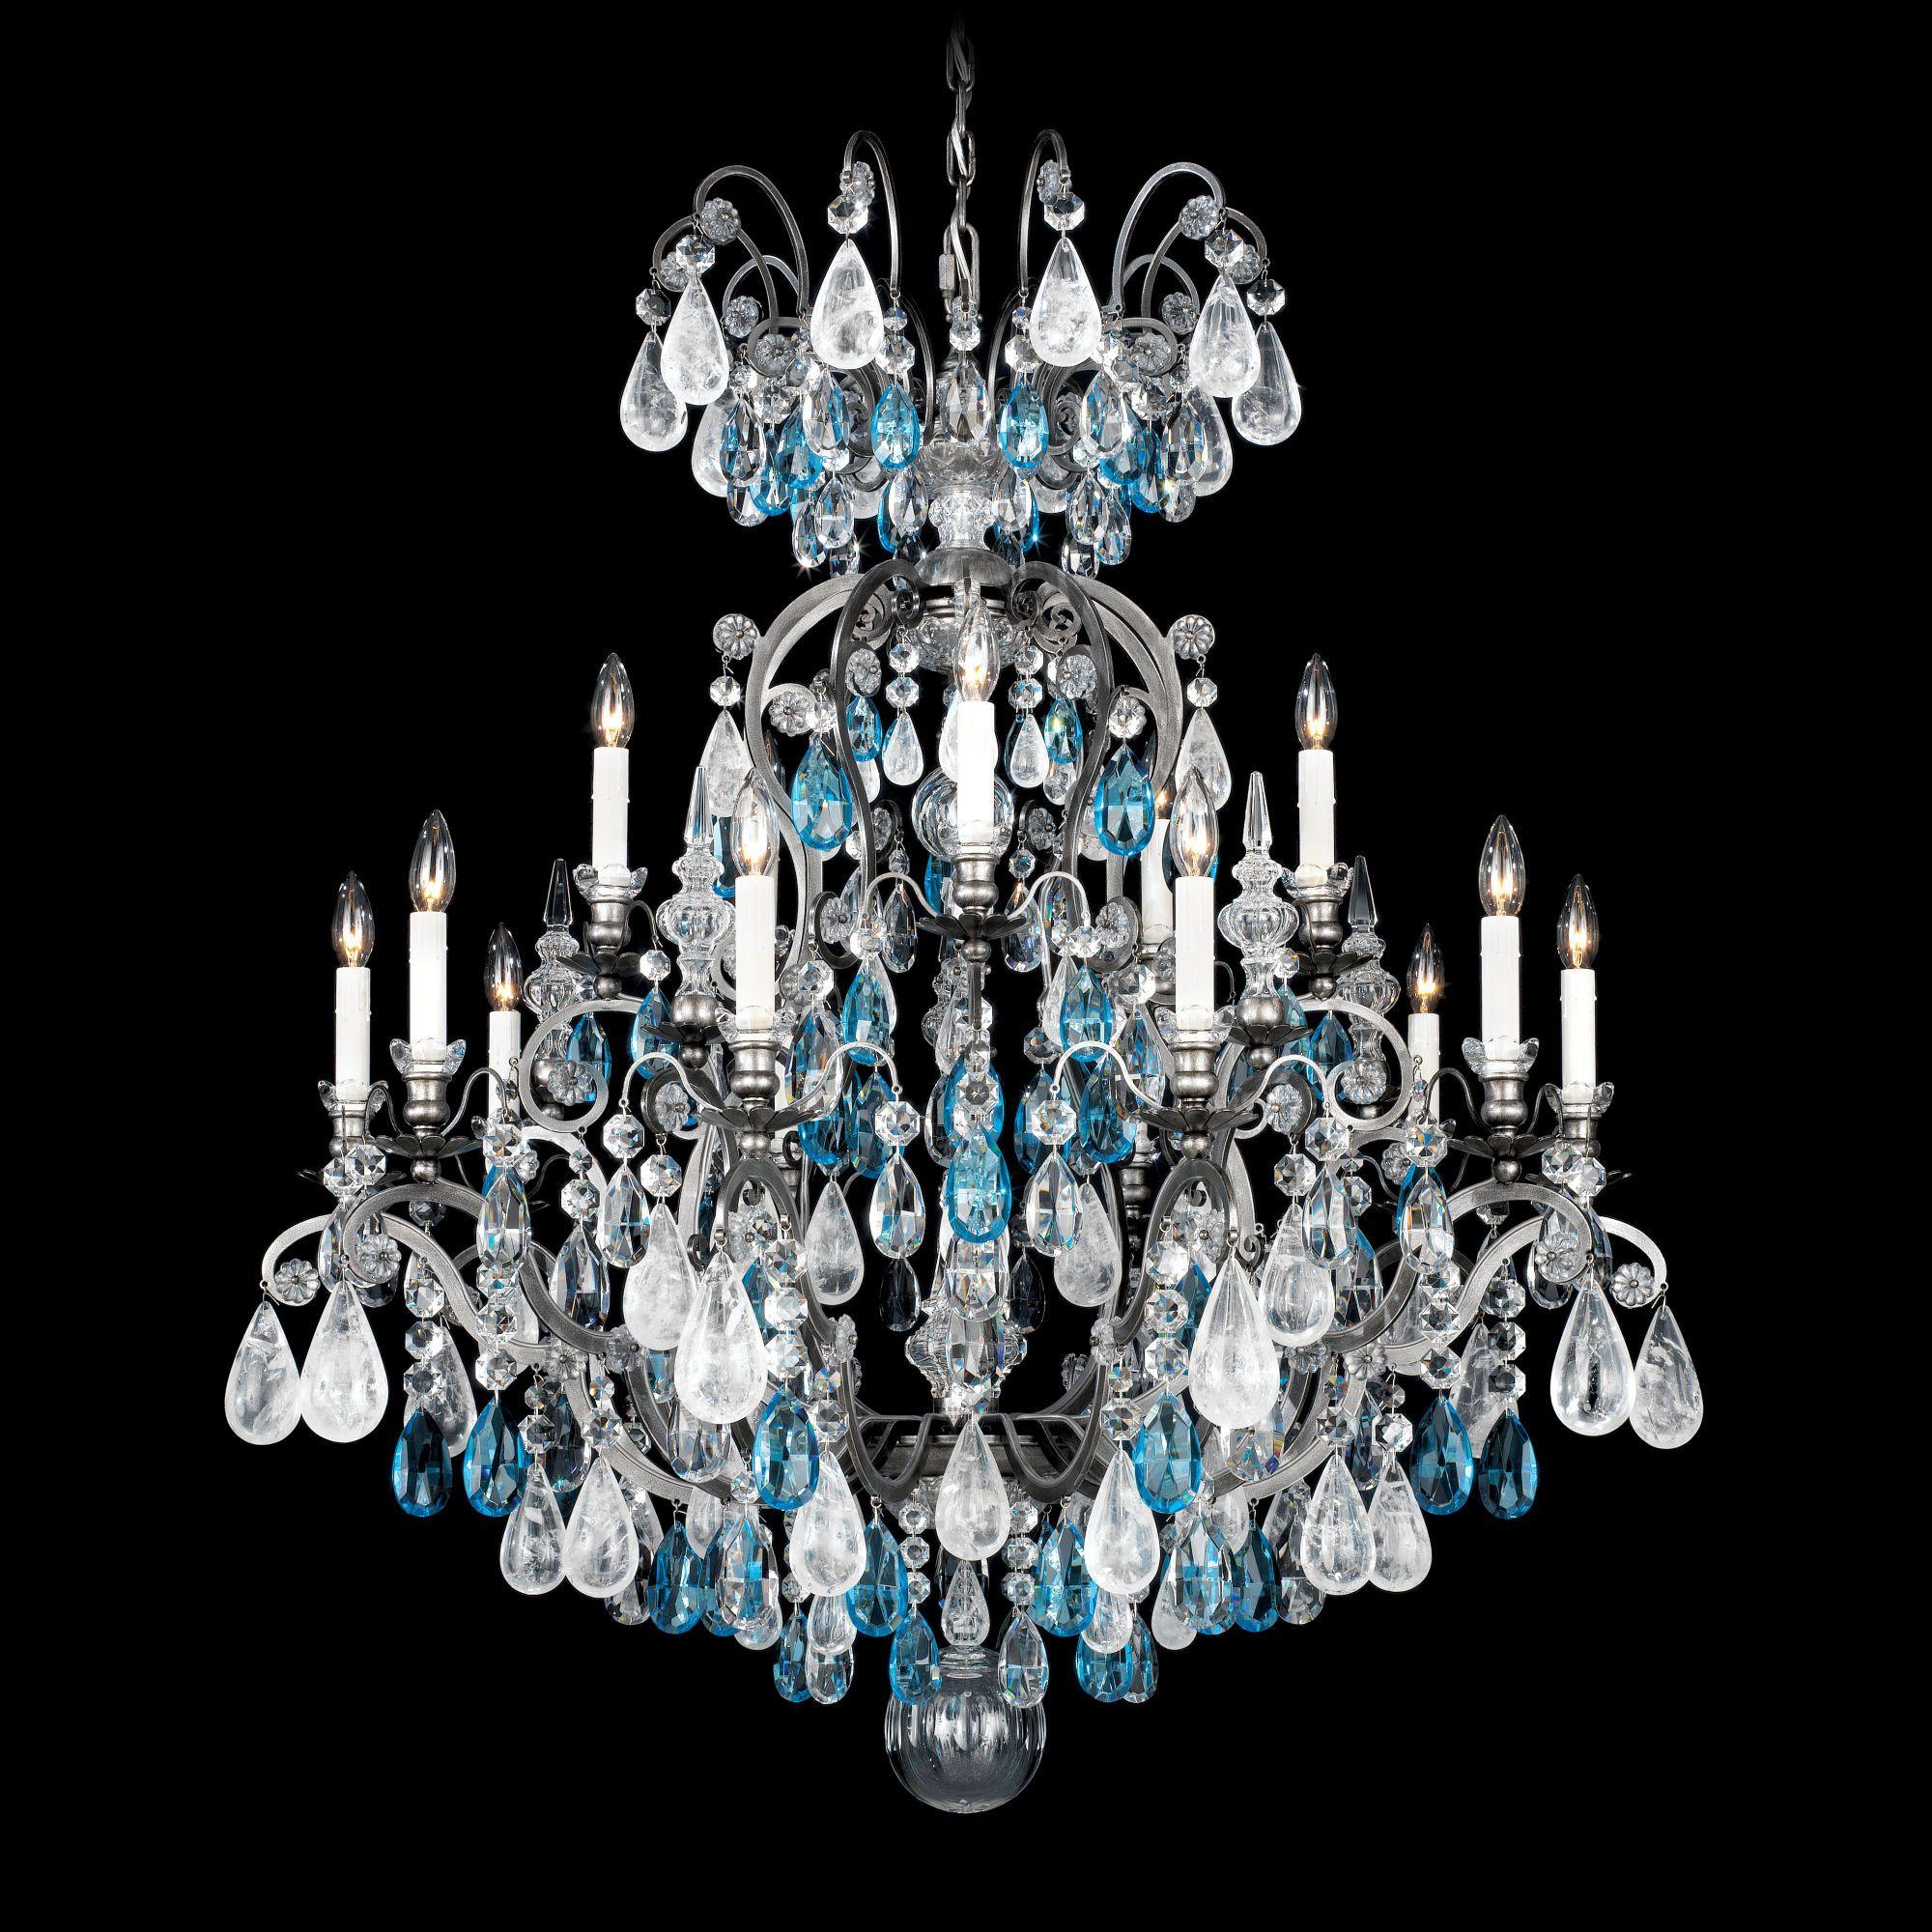 Schonbek Renaissance Rock Crystal 16 Light Chandelier